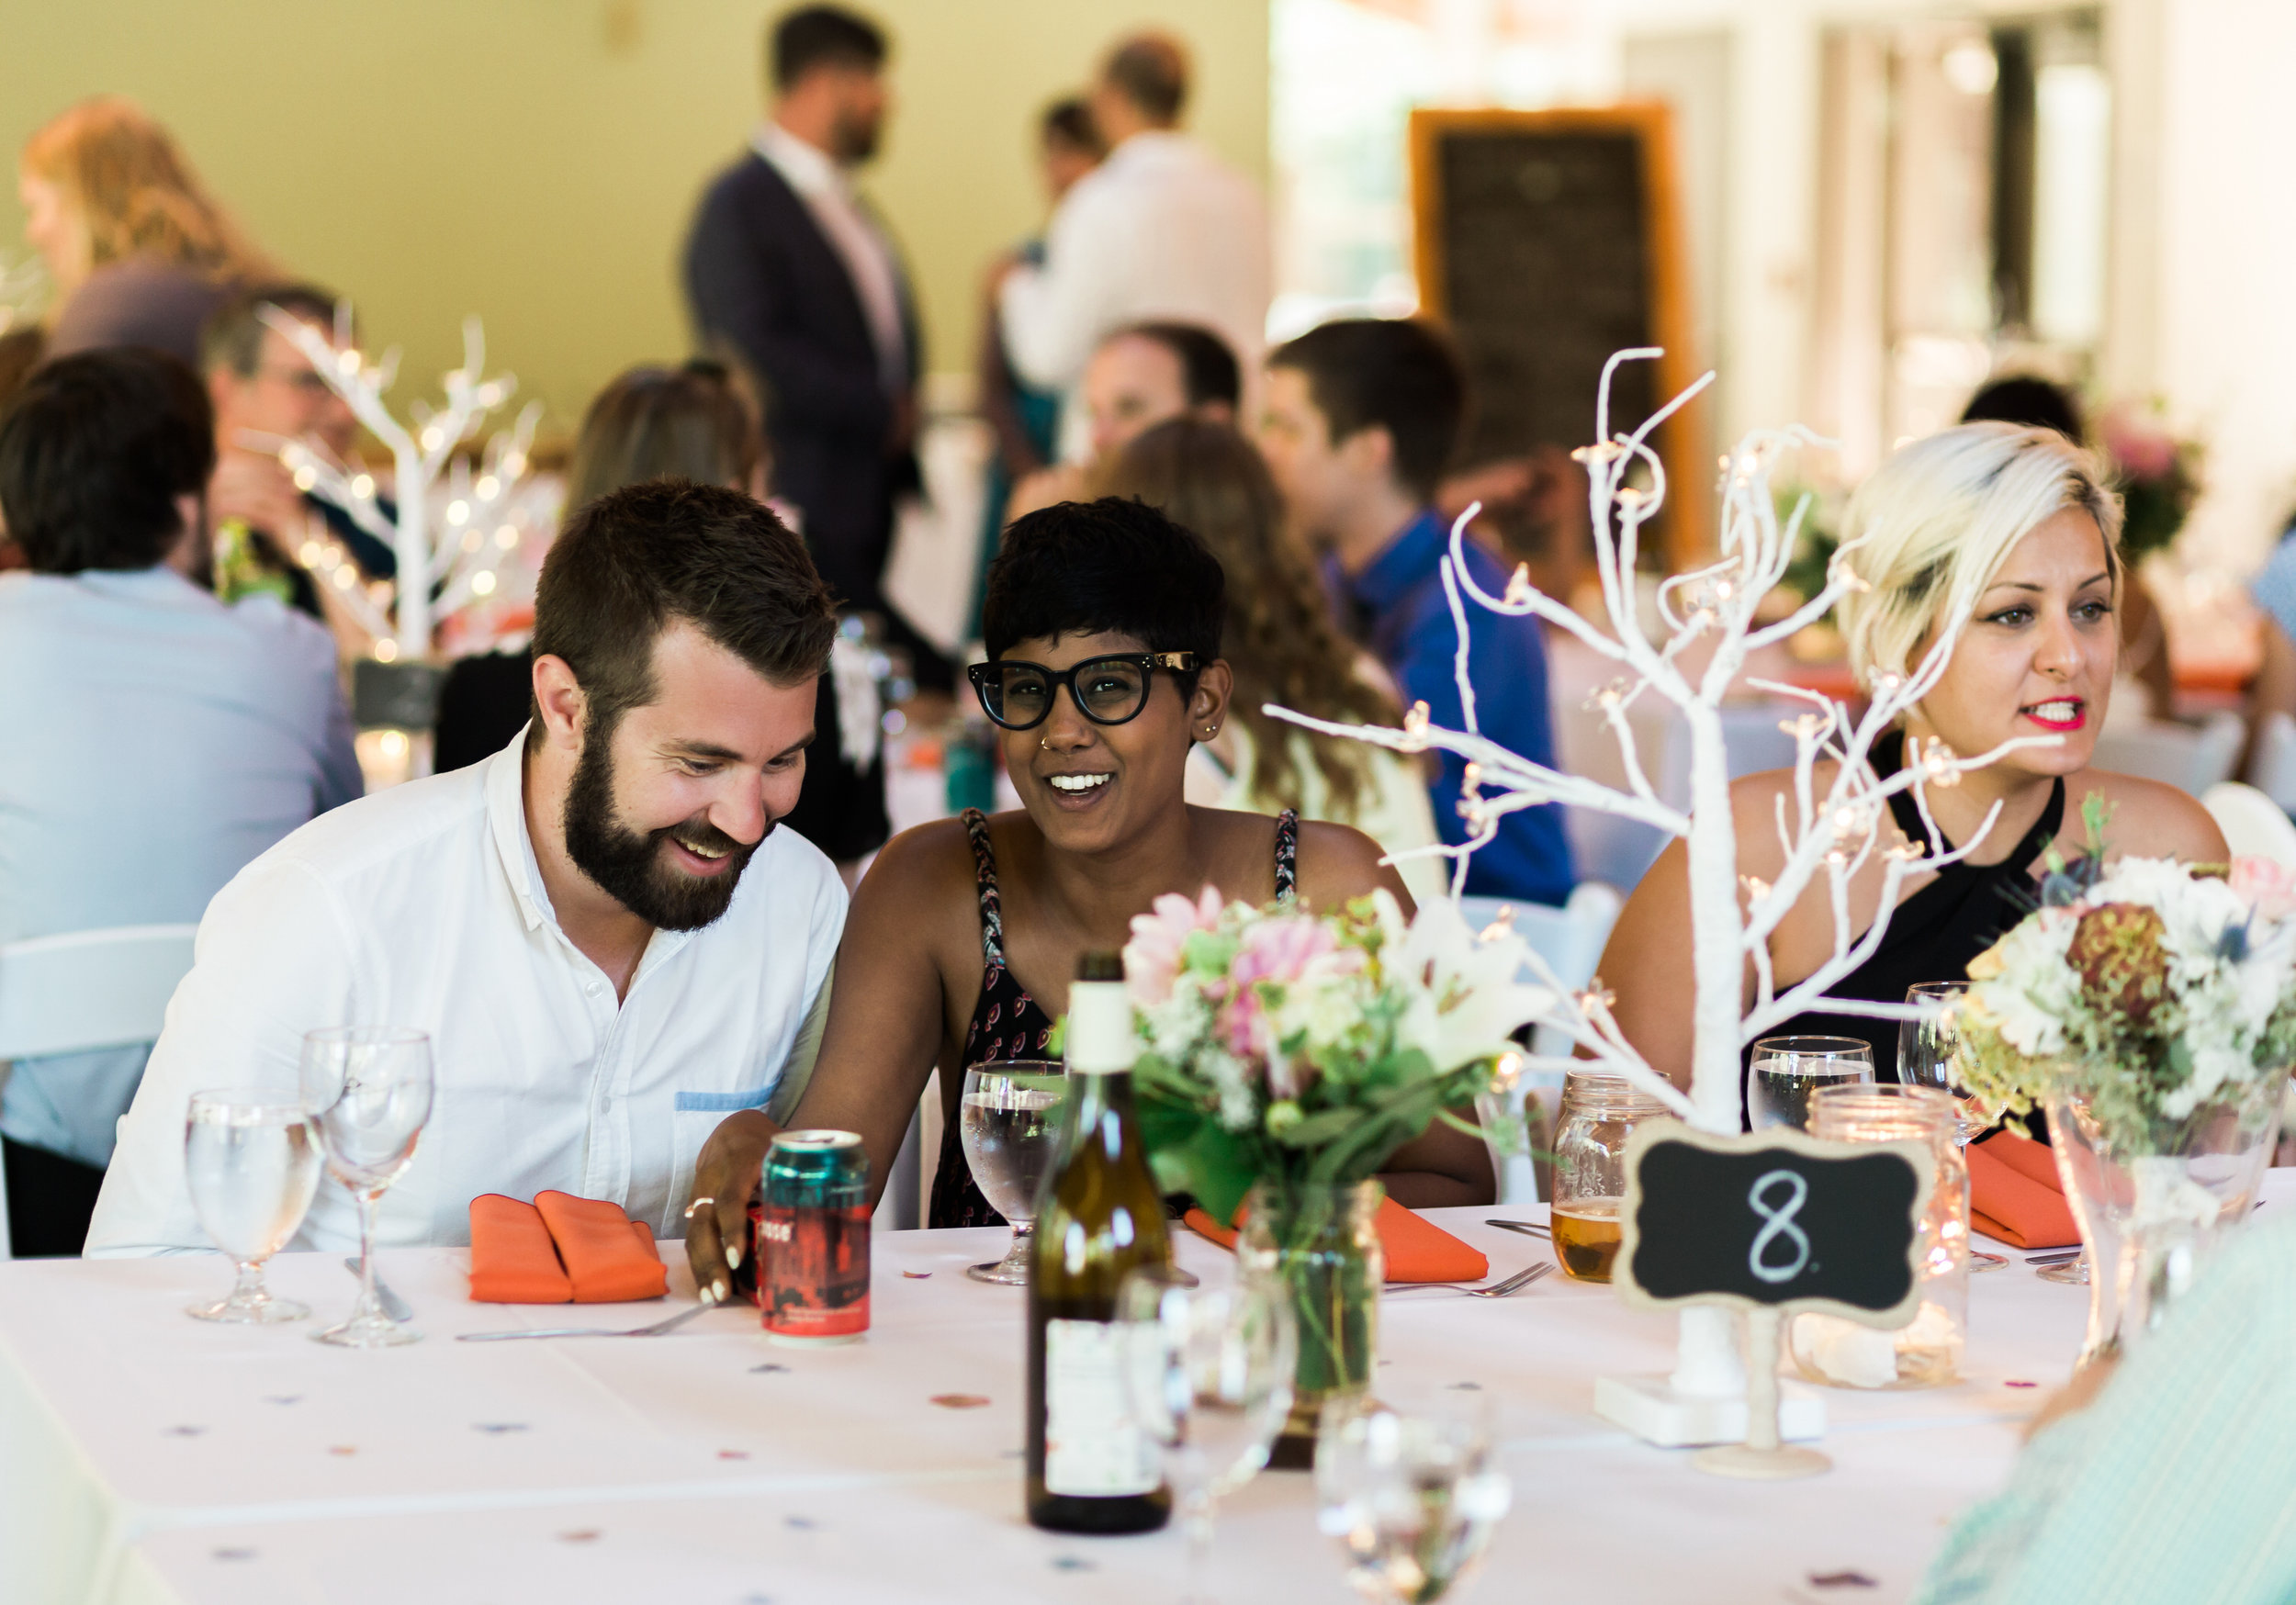 Camp Fircom Wedding - Vancouver Wedding Photographer & Videographer - Sunshine Coast Wedding Photos - Sunshine Coast Wedding Photographer - Jennifer Picard Photography - IMG_2212.jpg